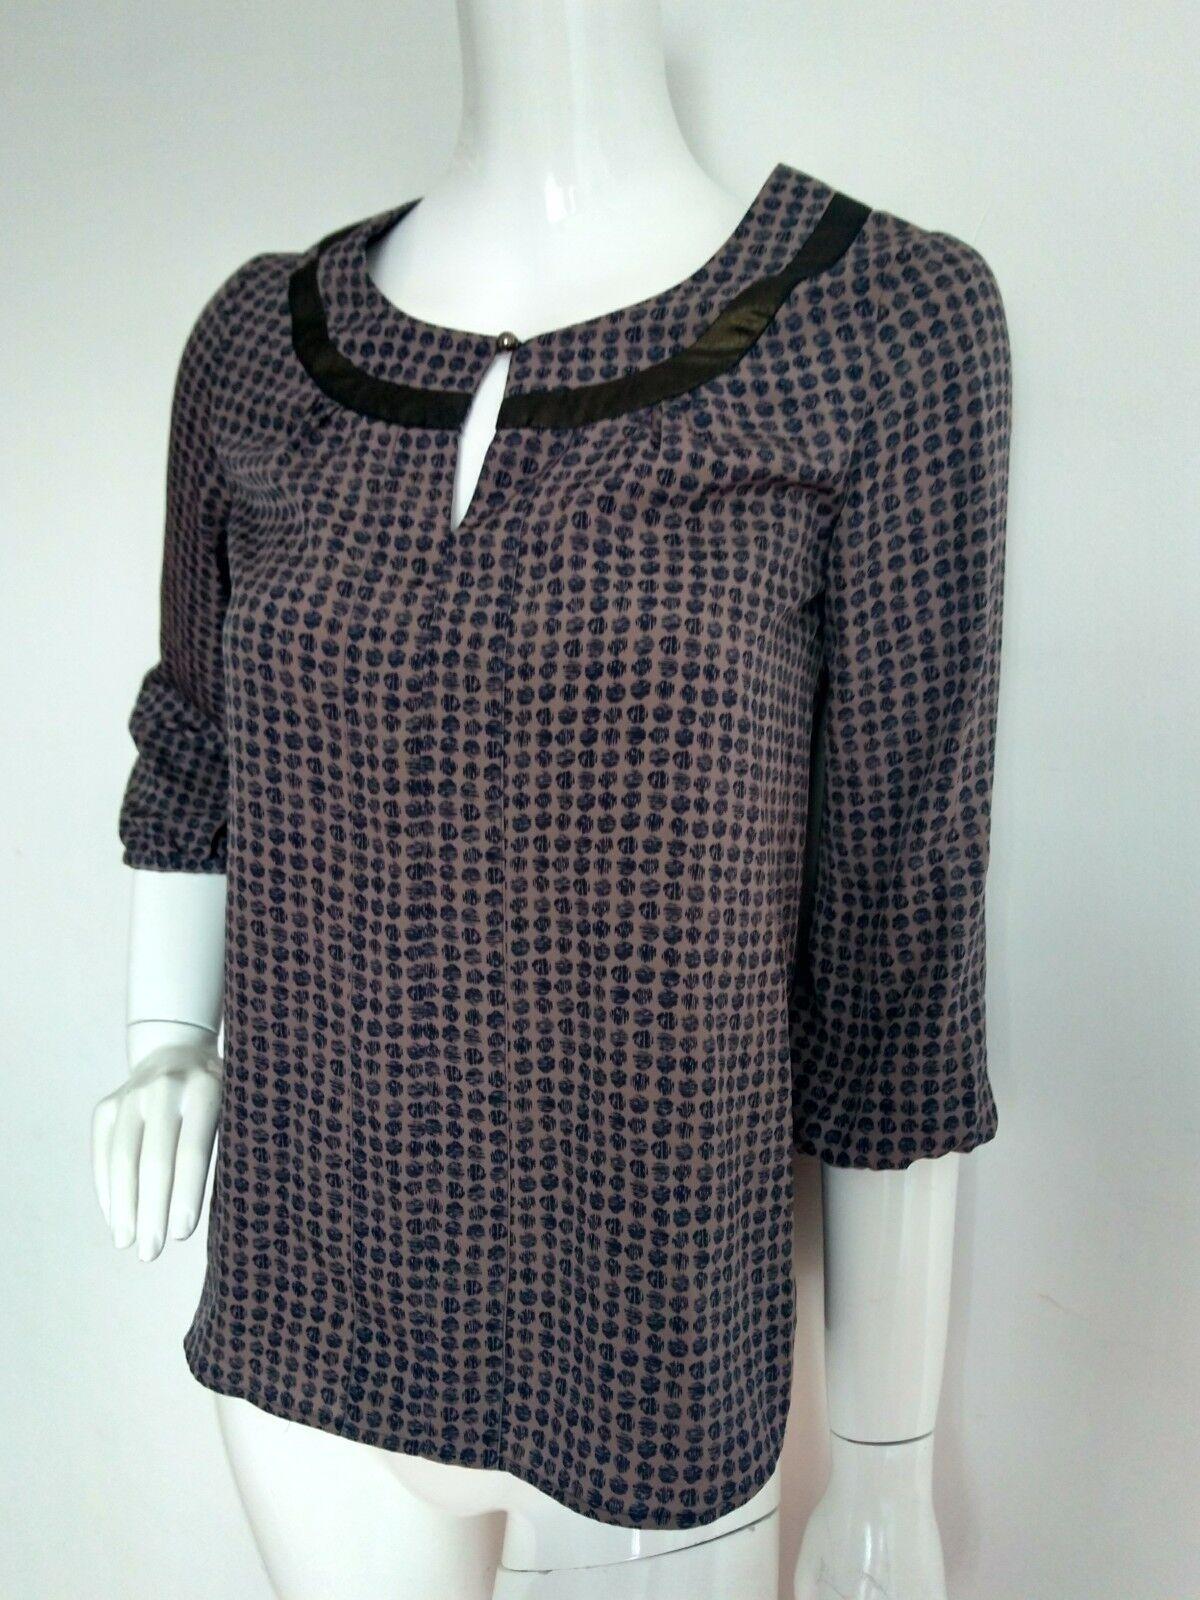 Designer EDINA RONAY loose blouse Größe 8 --USED ONCE-- mocha navy 3 4 Sleeve